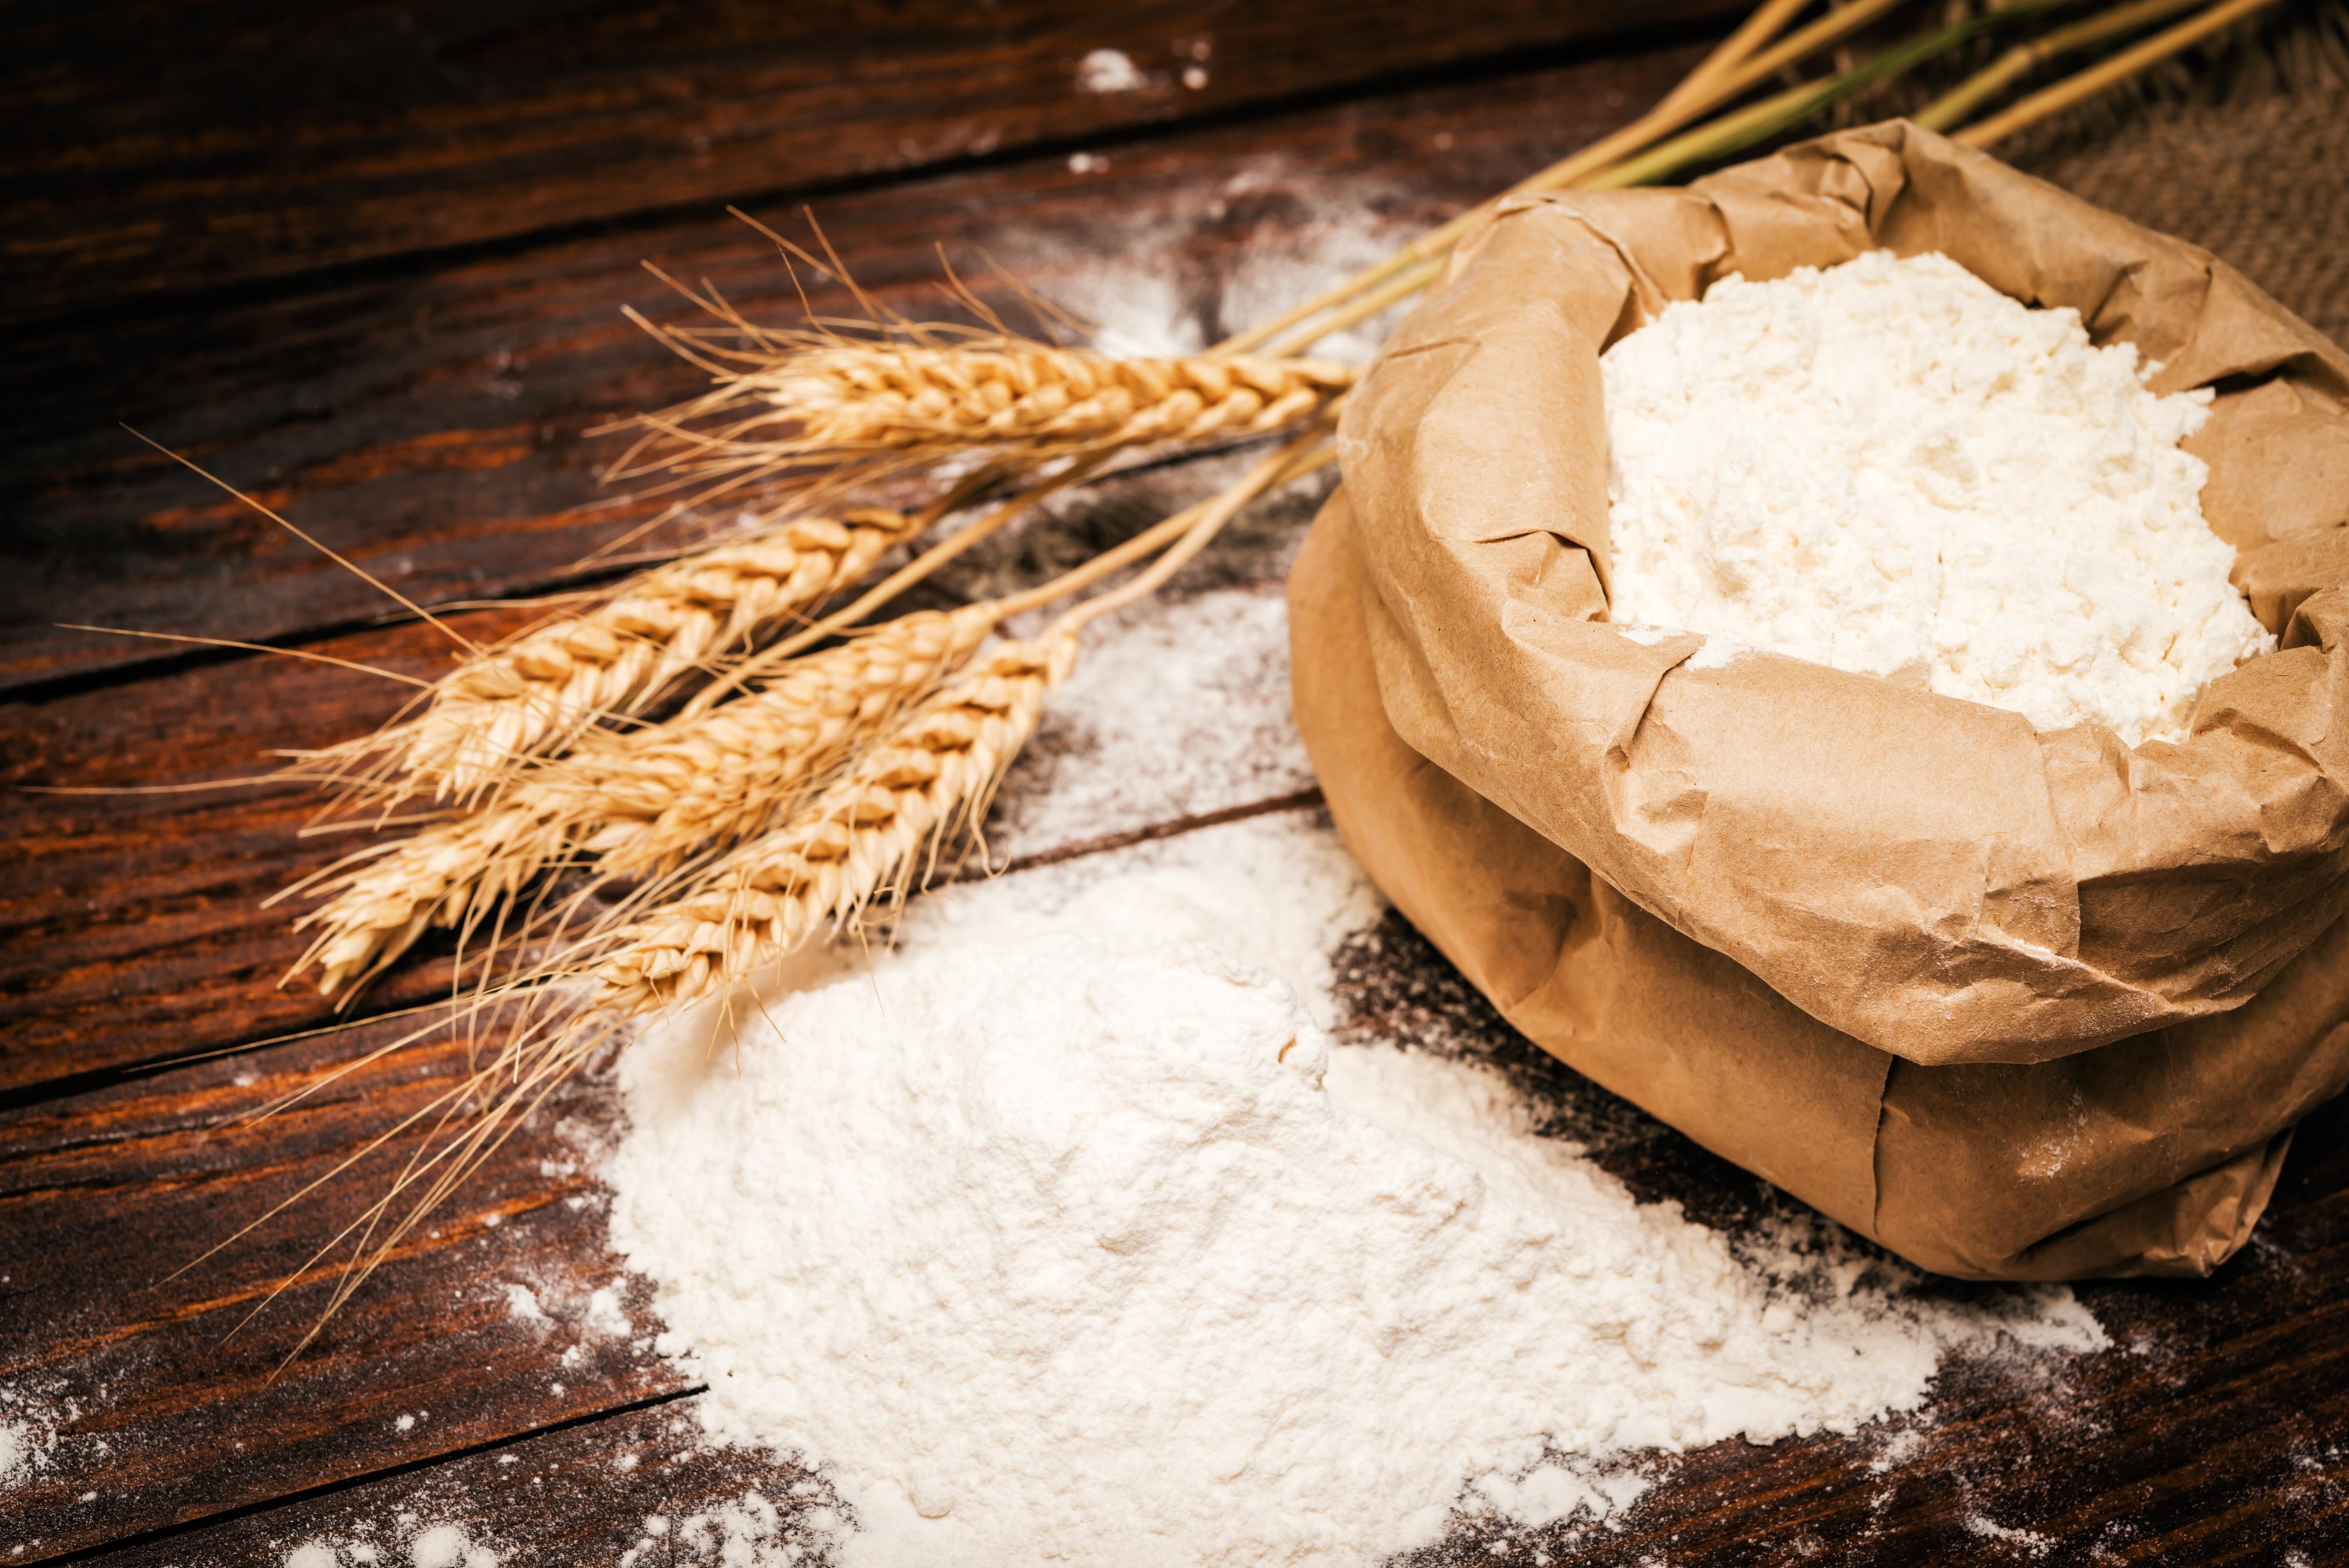 Flour_adobestock_107376106